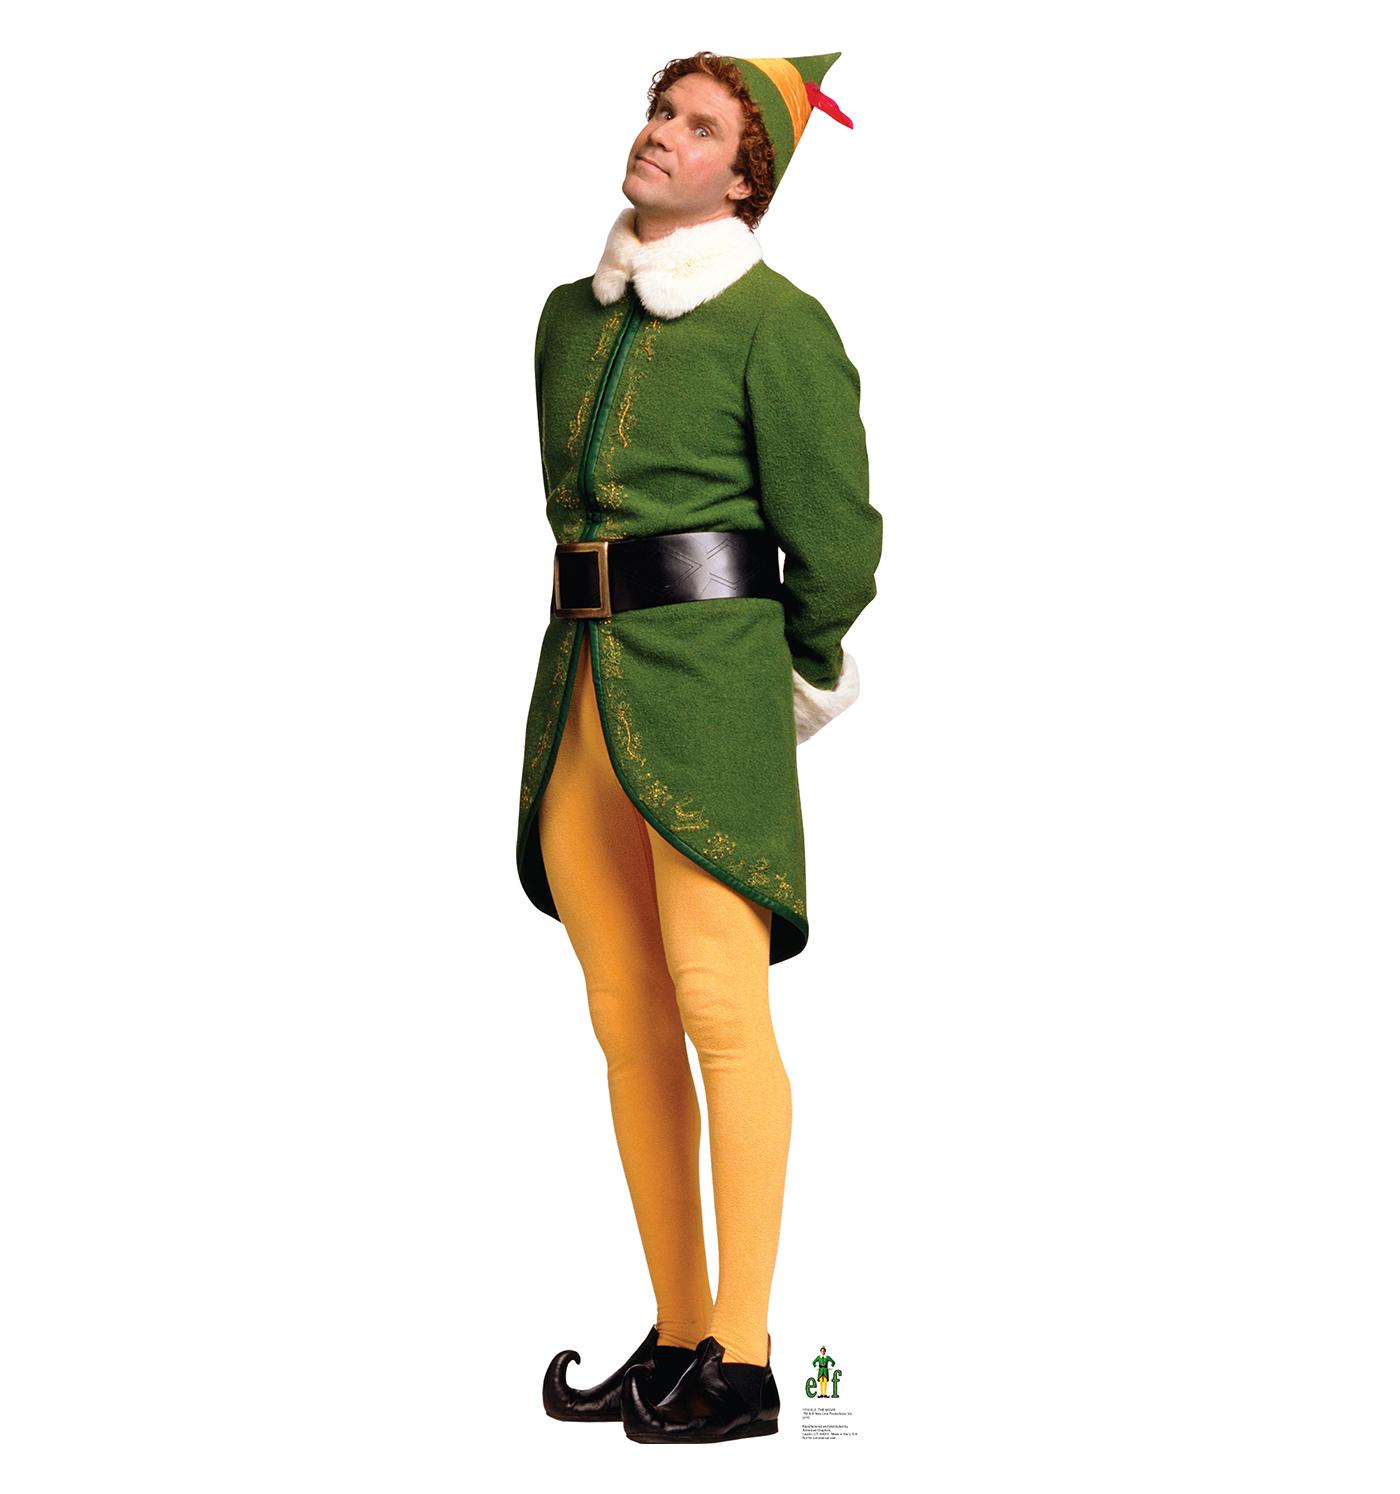 Elf 2003 Poster Christmas Movies Photo 40027606 Fanpop